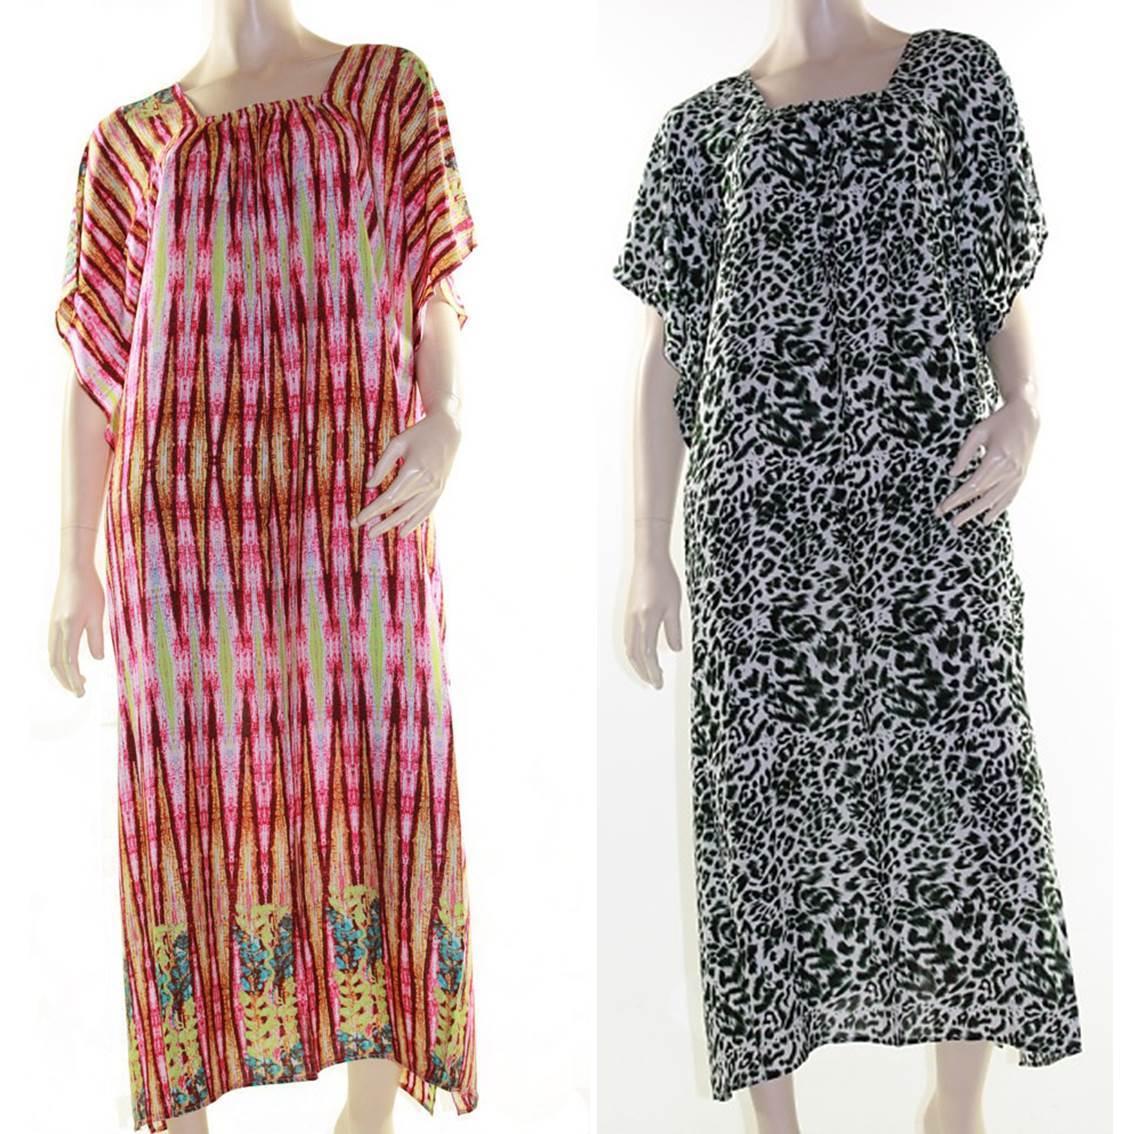 bb776deb13bf0 Maxi Kaftan Dress Caftan Plus Size 10 - 30 Women Paisley Long Cover ...